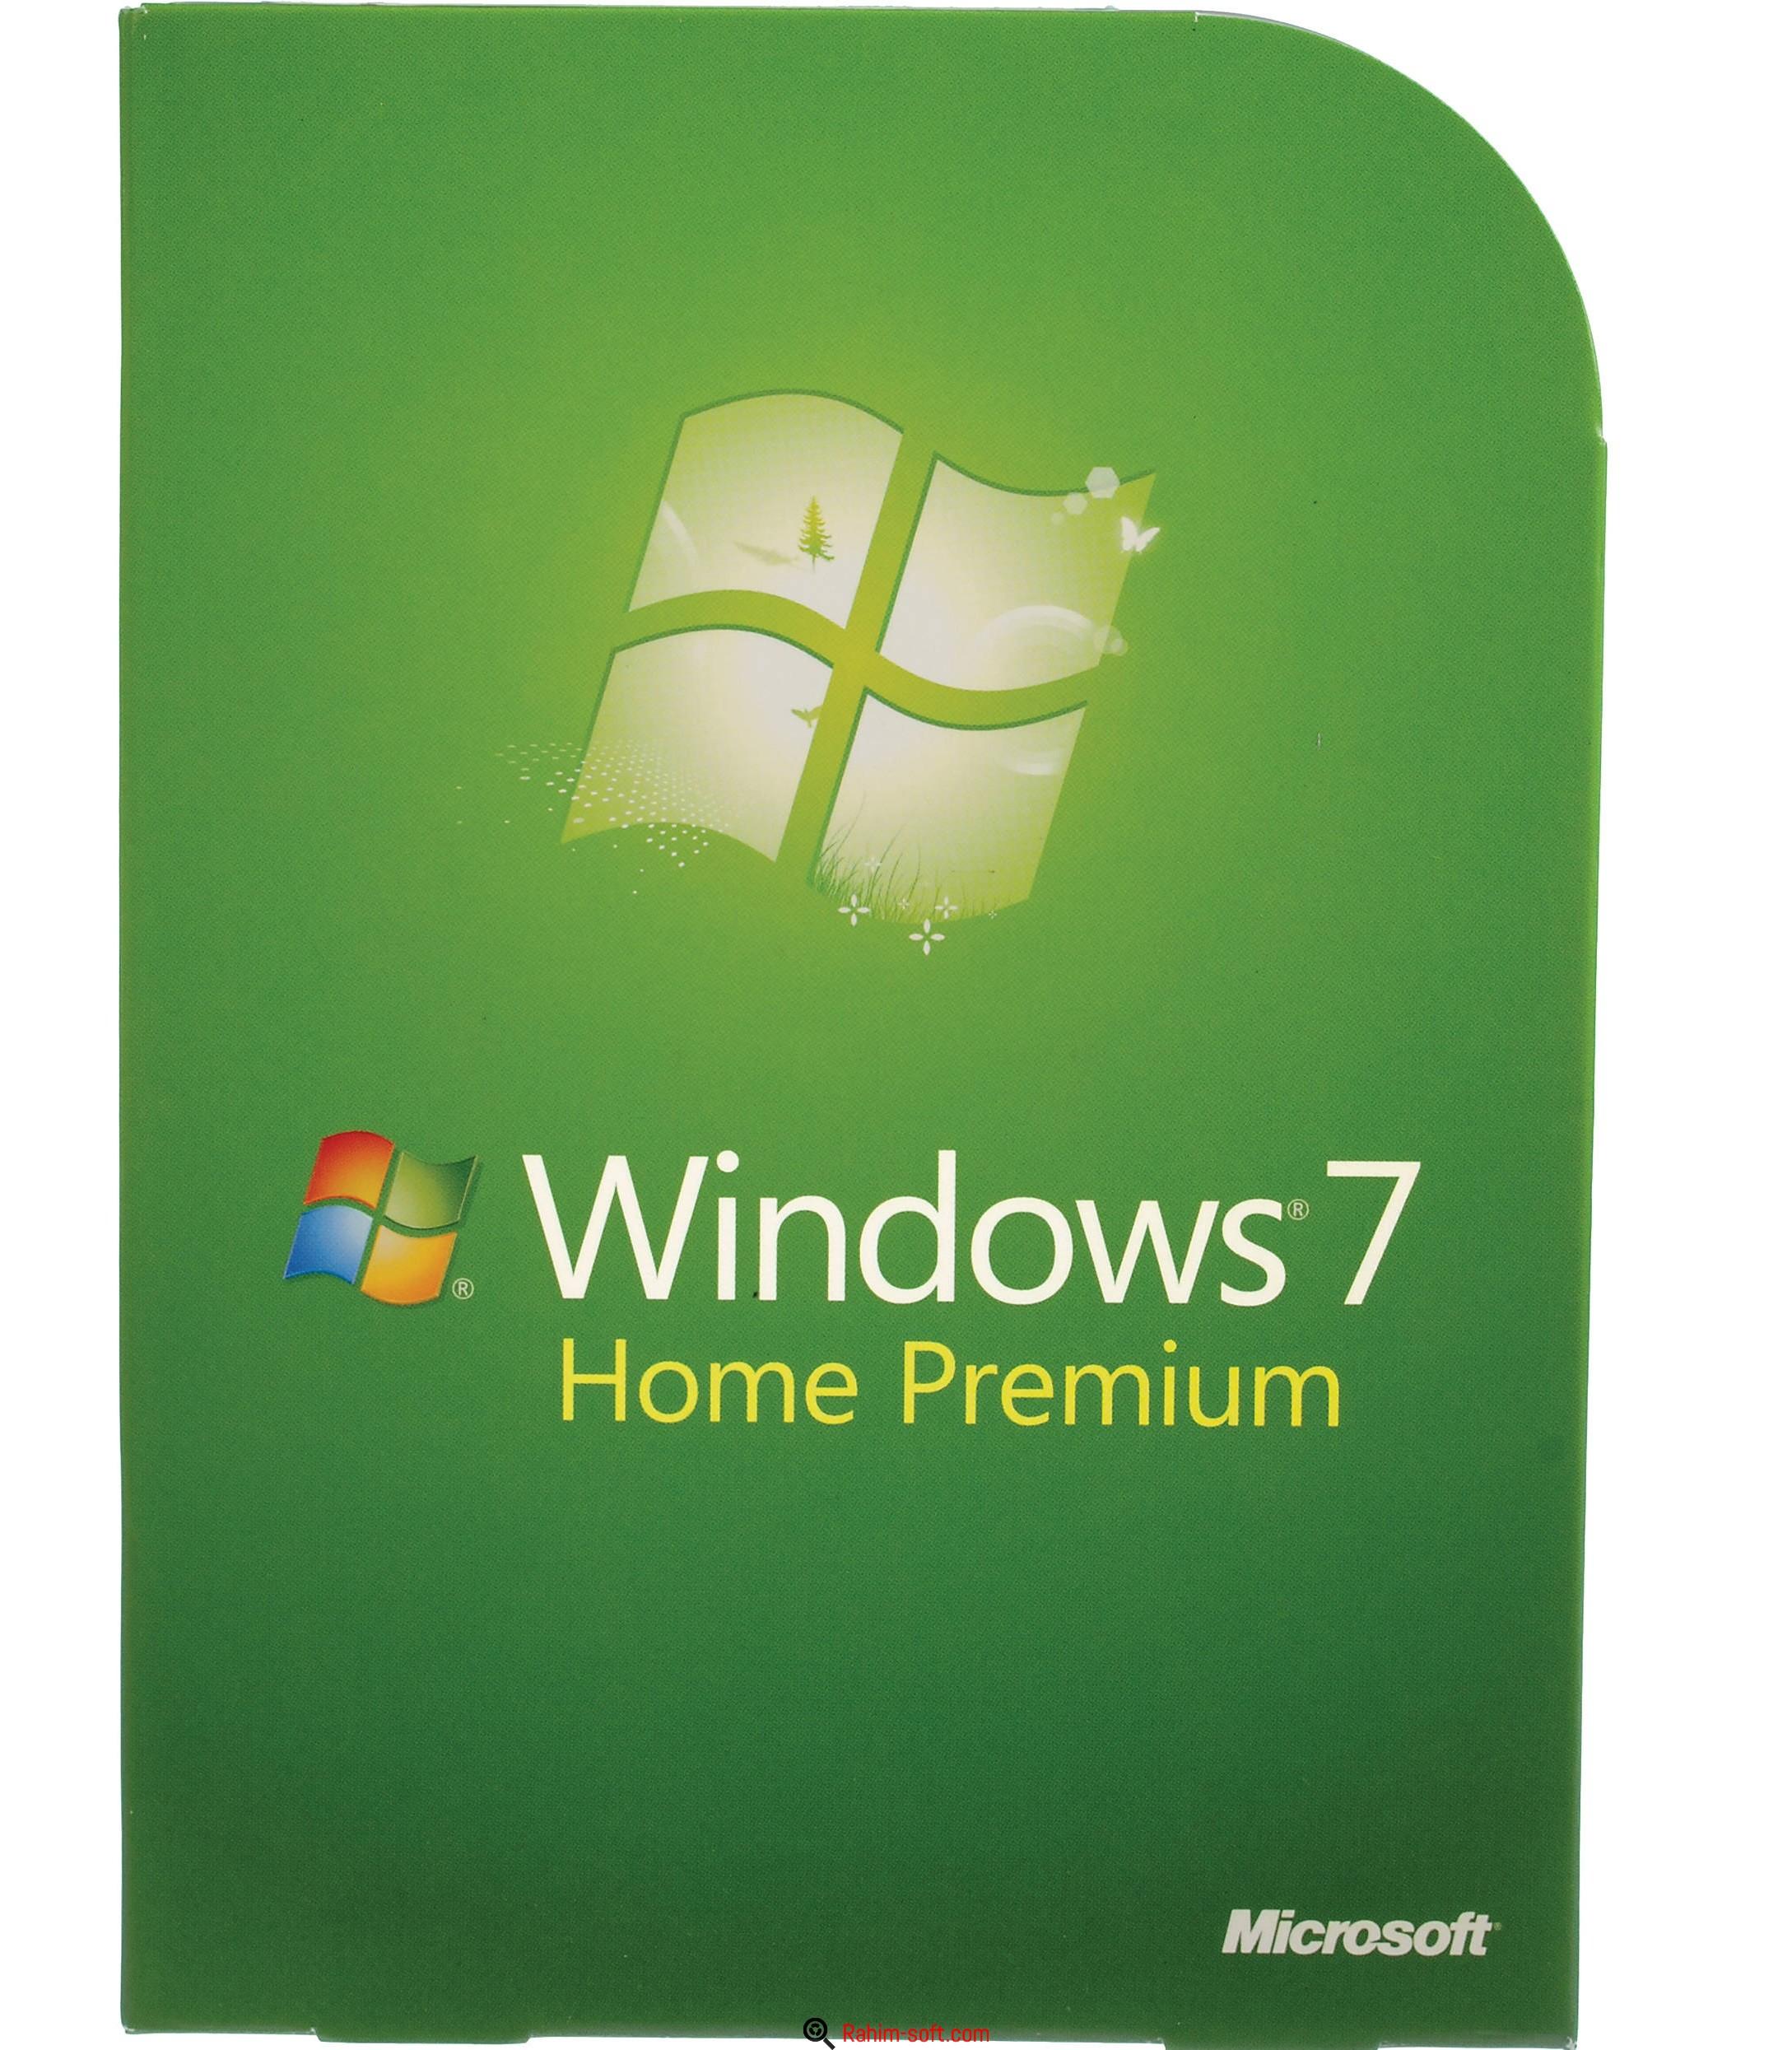 windows 7 home premium iso Free download